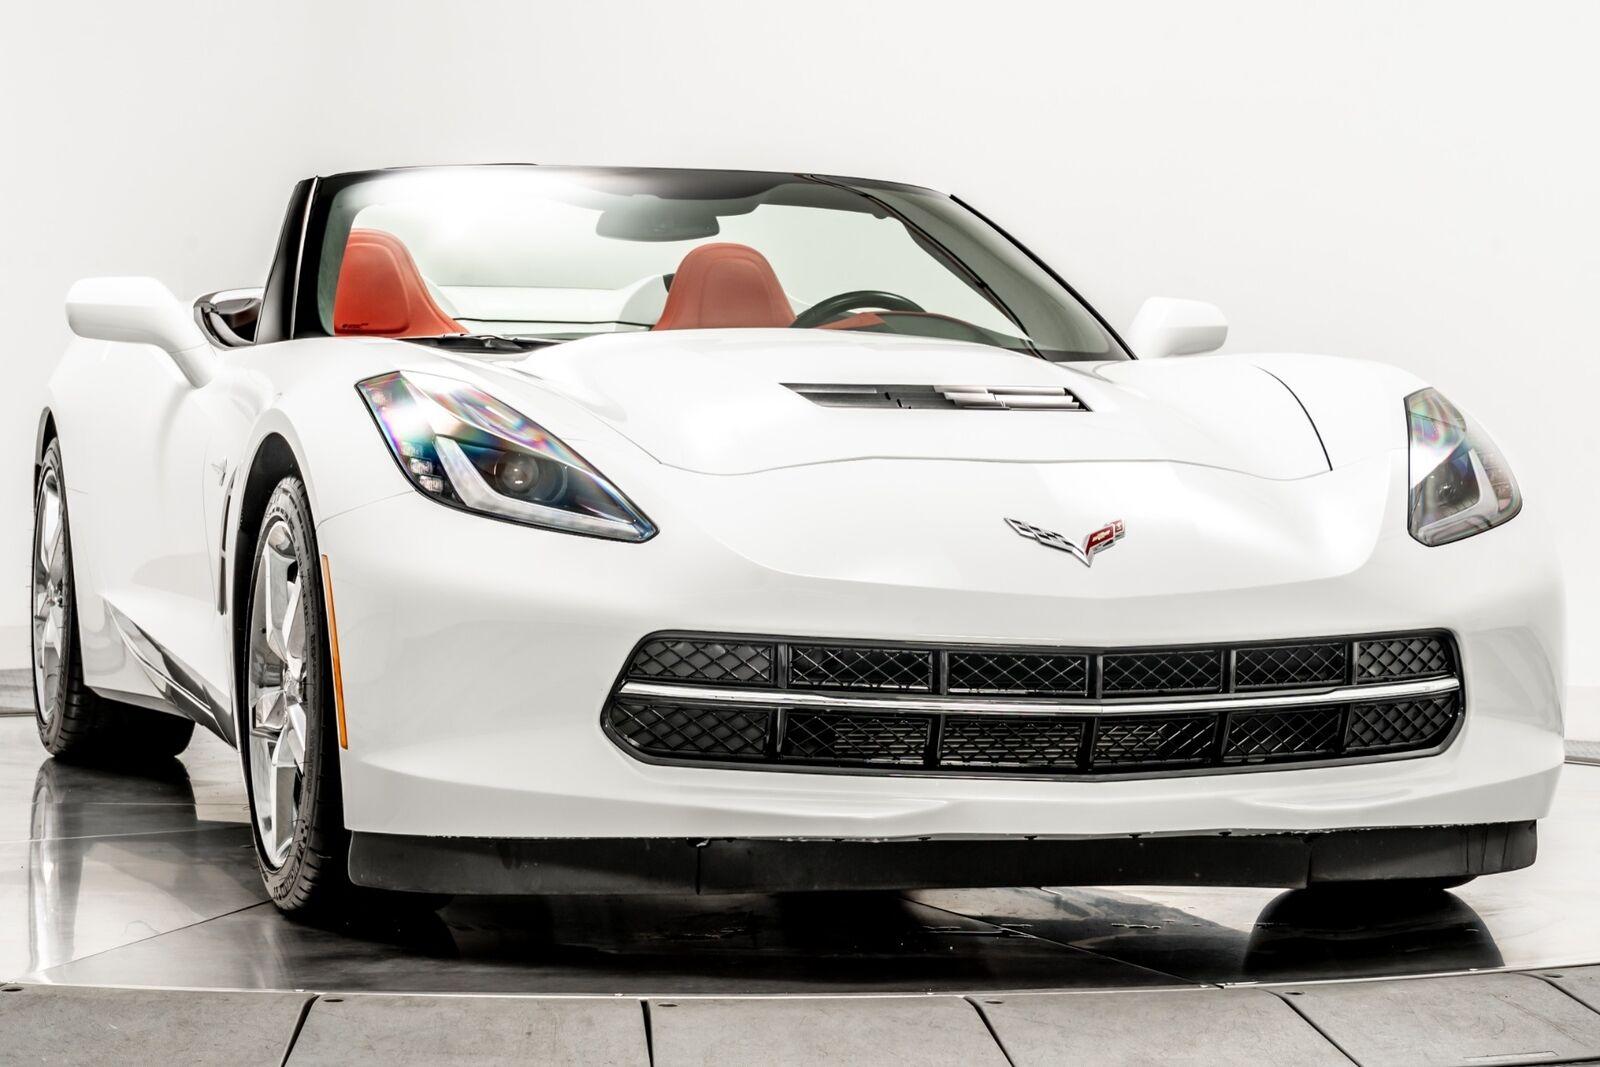 2015 White Chevrolet Corvette Convertible 3LT   C7 Corvette Photo 2